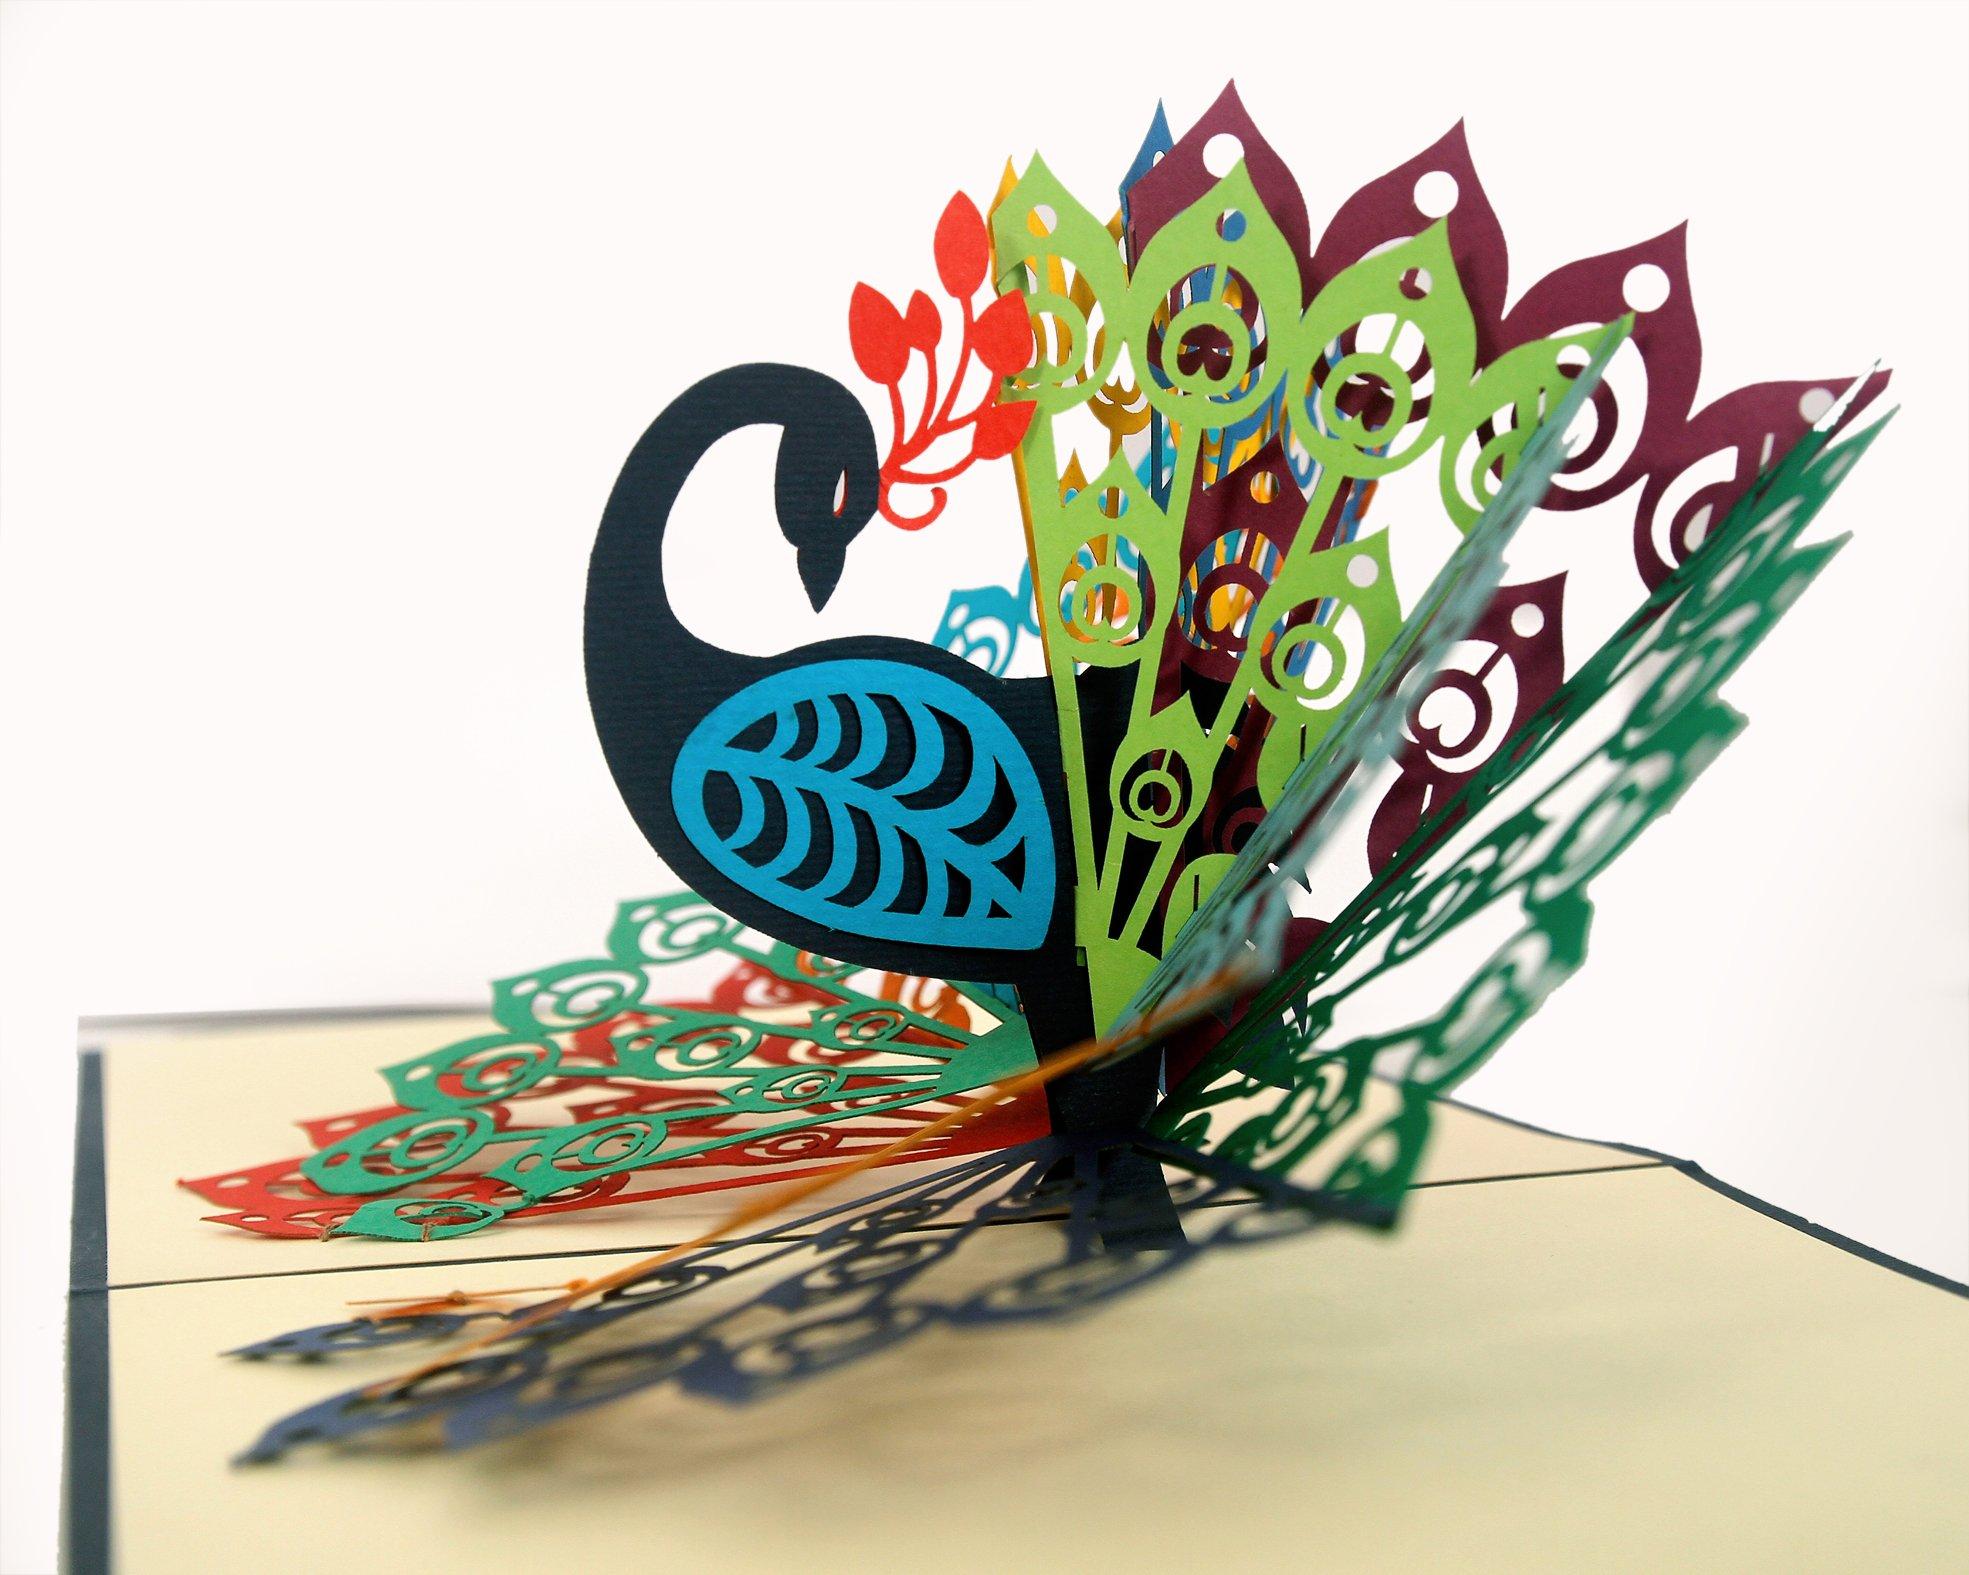 bda2195bf5df CUTPOPUP Peacock Bird 3D Pop-Up Greeting Card – Charming Design